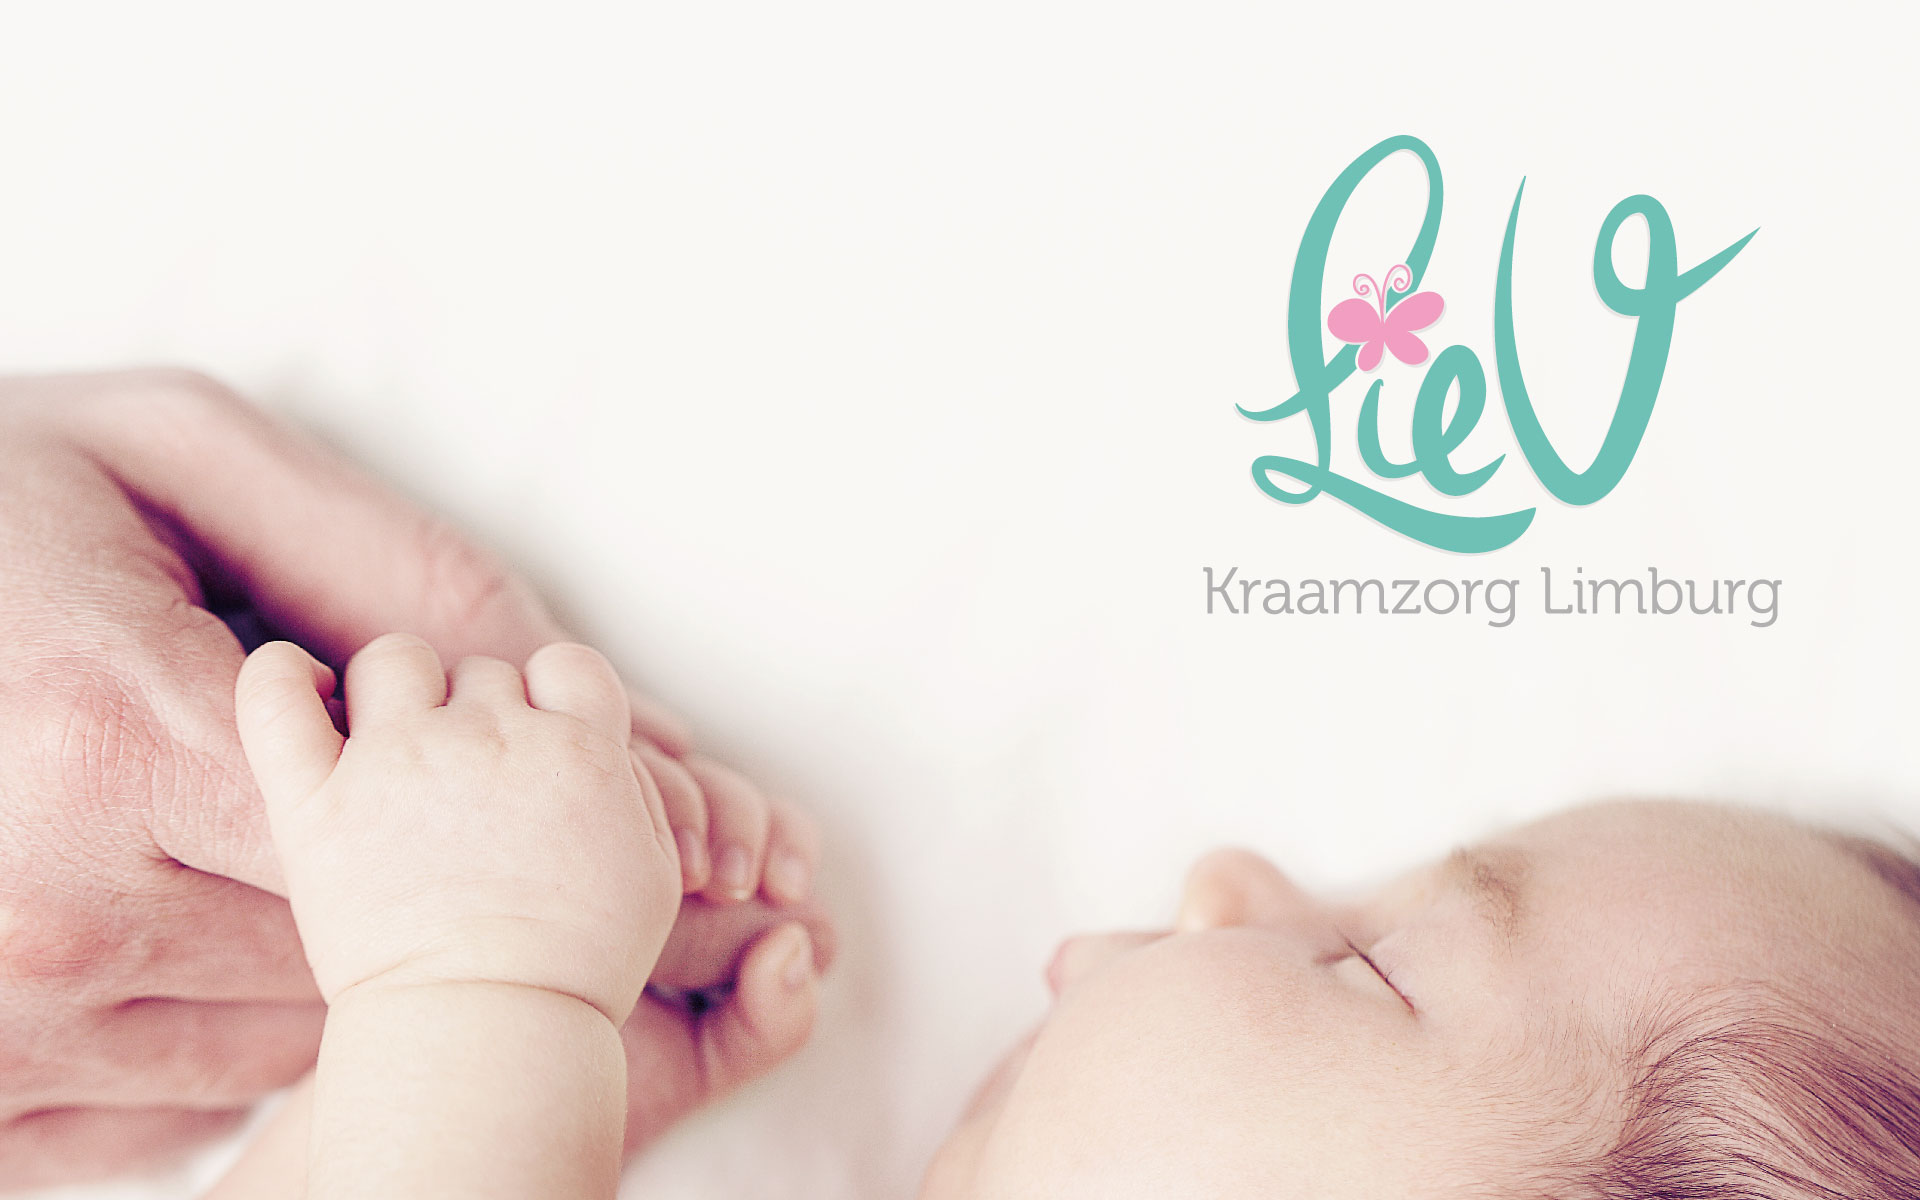 LieV Kraamzorg Limburg – logo